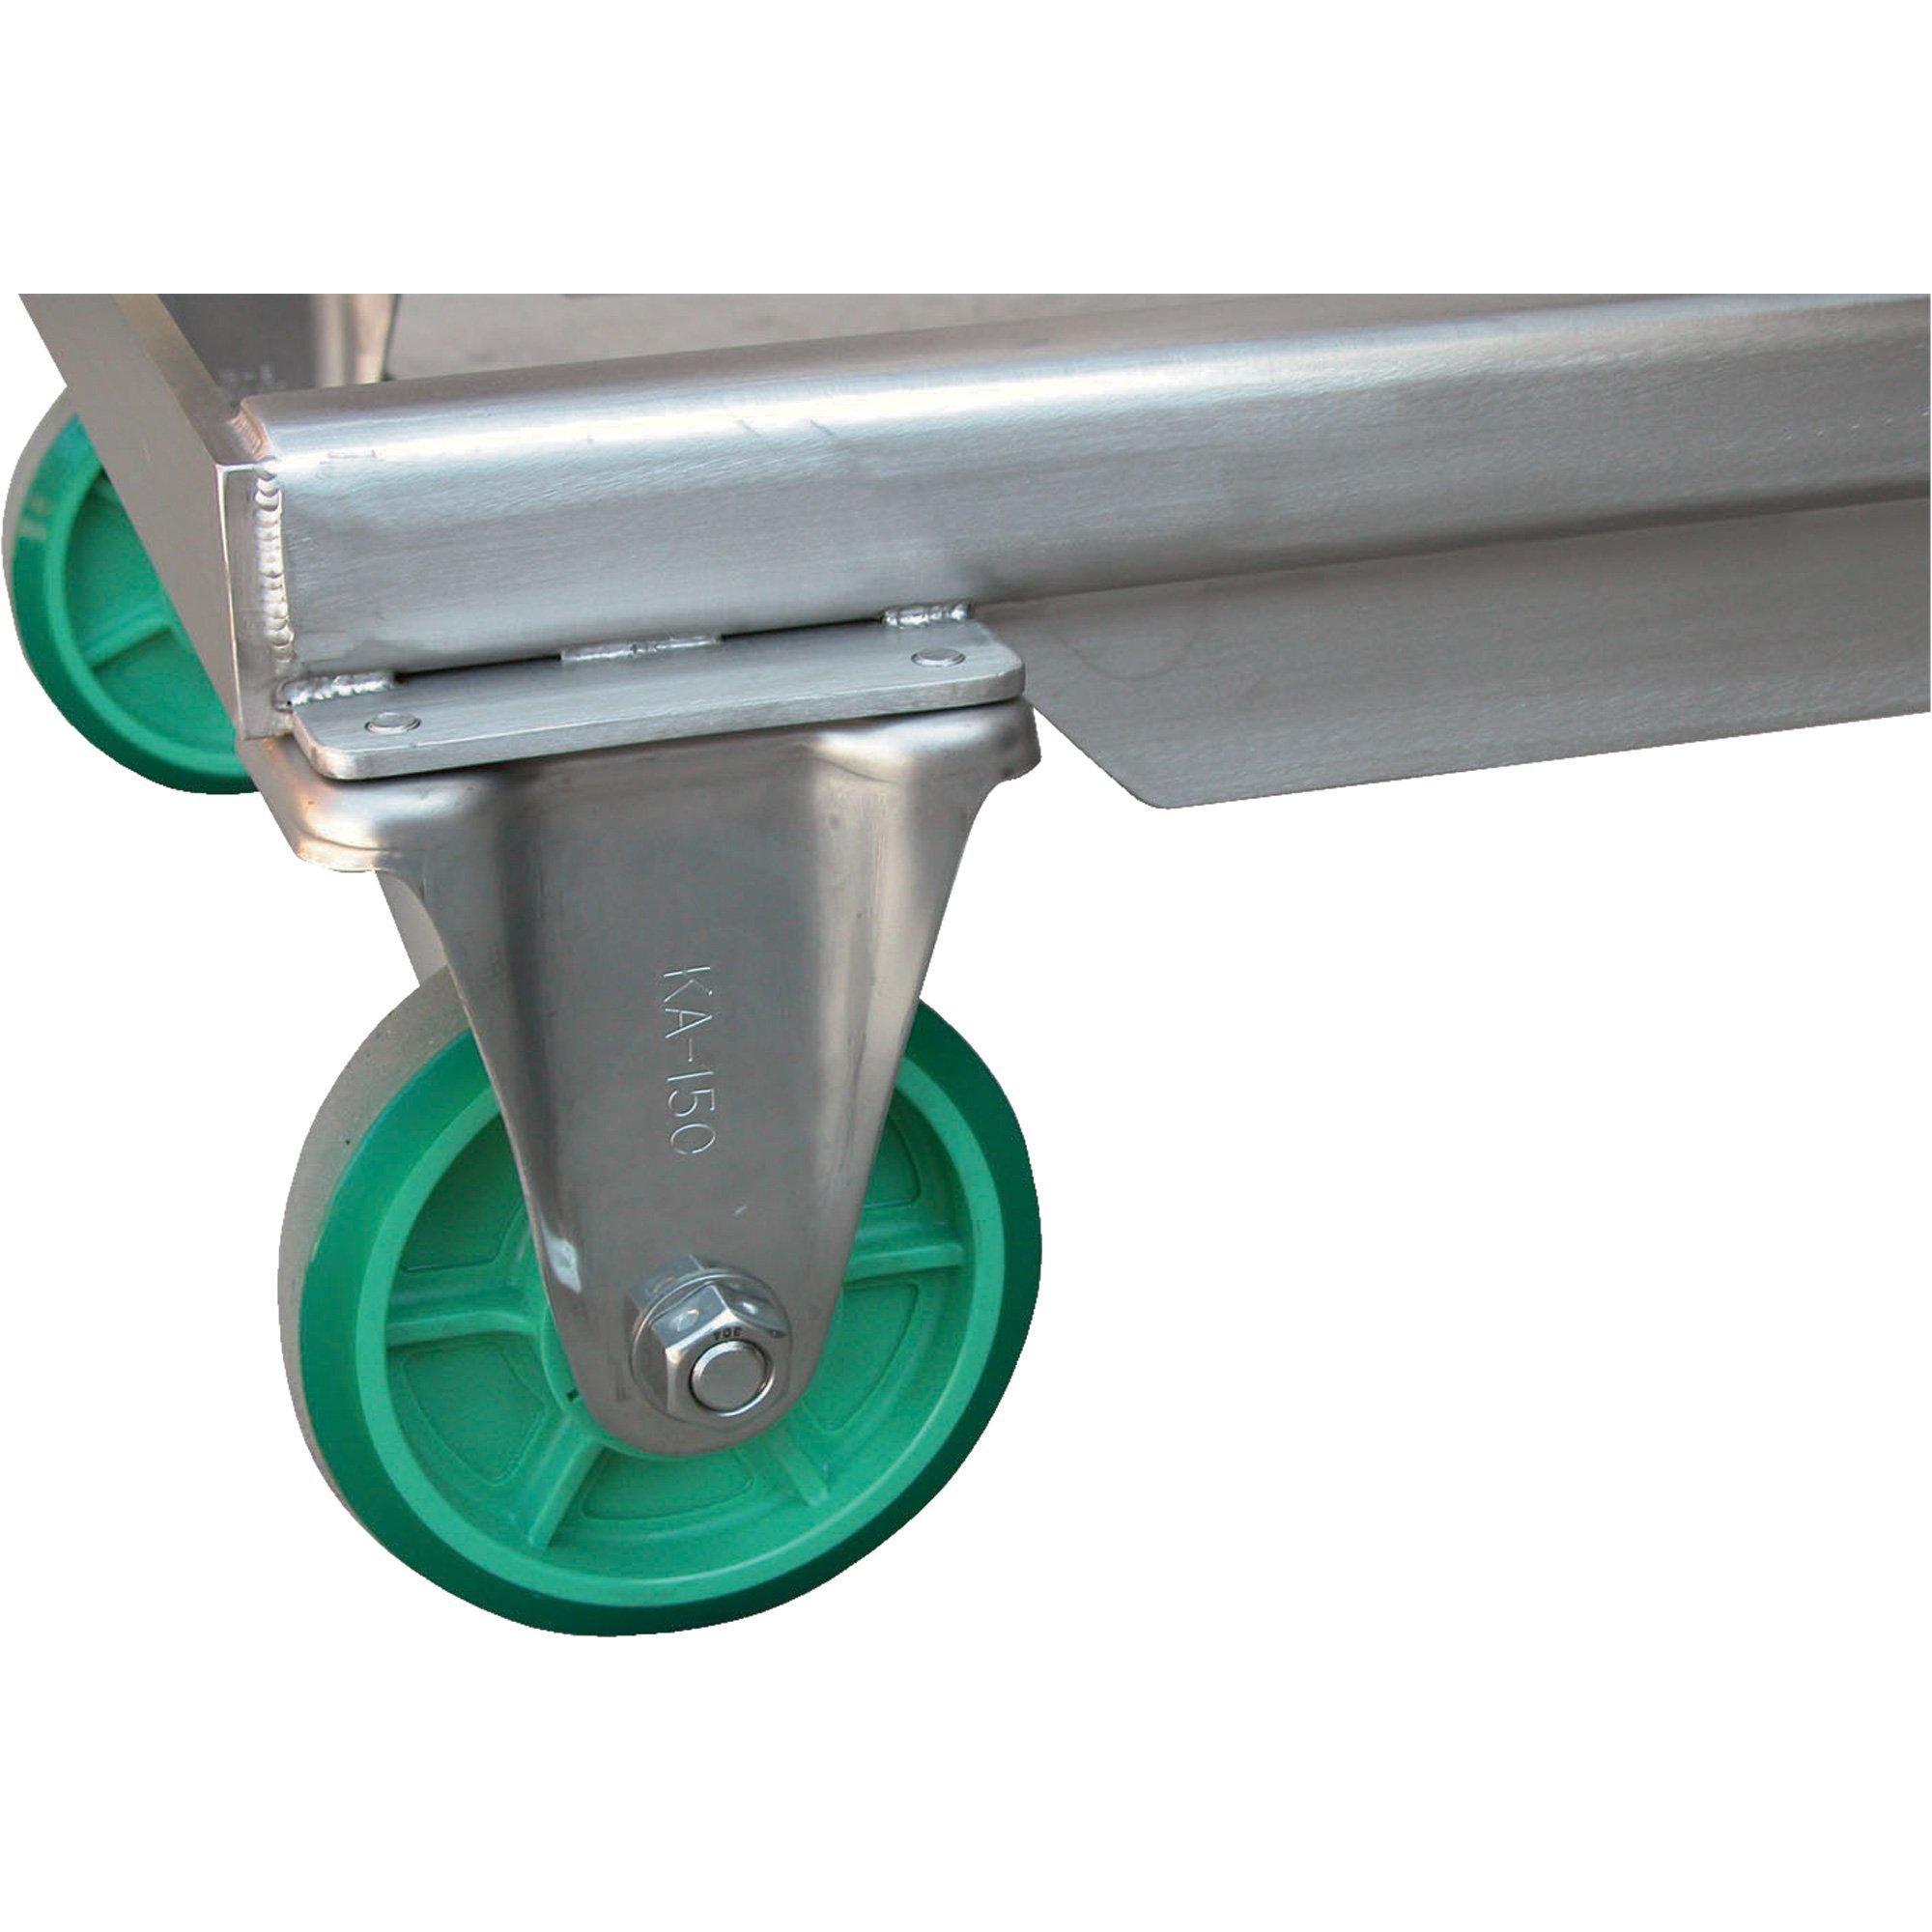 Vestil CART-550-SS Hydraulic Scissor Lift Cart, Stainless Steel, 550 lb. Capacity, 31-1/2'' x 19-1/2'' Platform, 9-3/4'' to 33-1/2'' Service Range